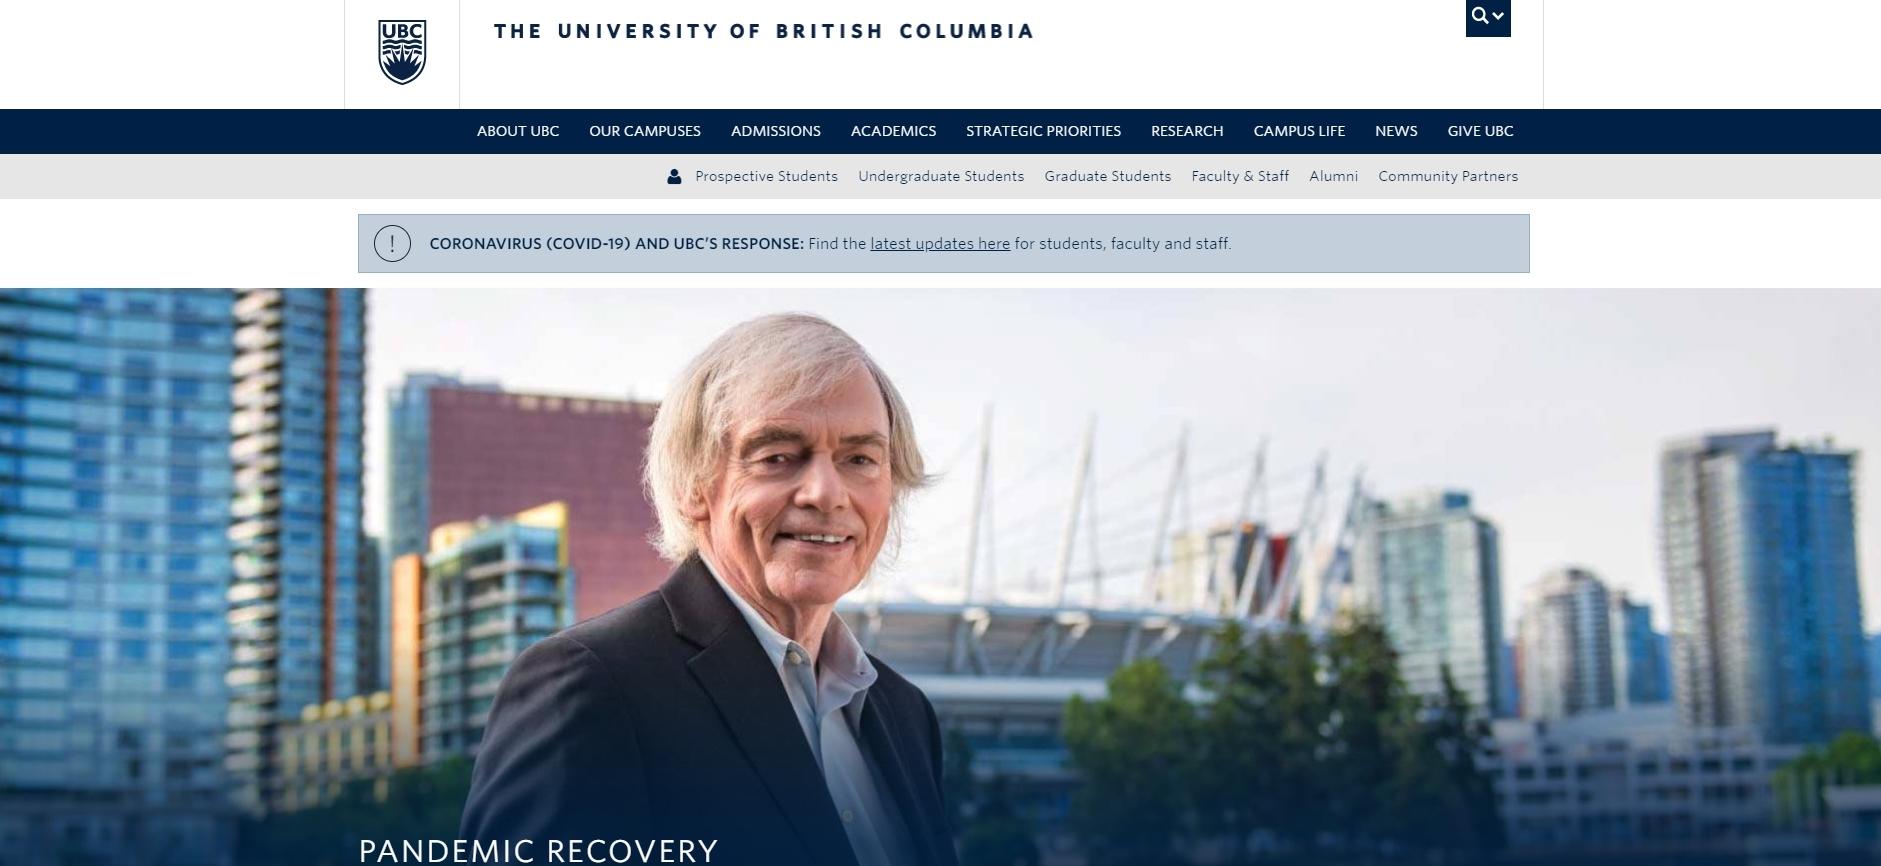 University of British Columbia - Computer Science Universities In Canada